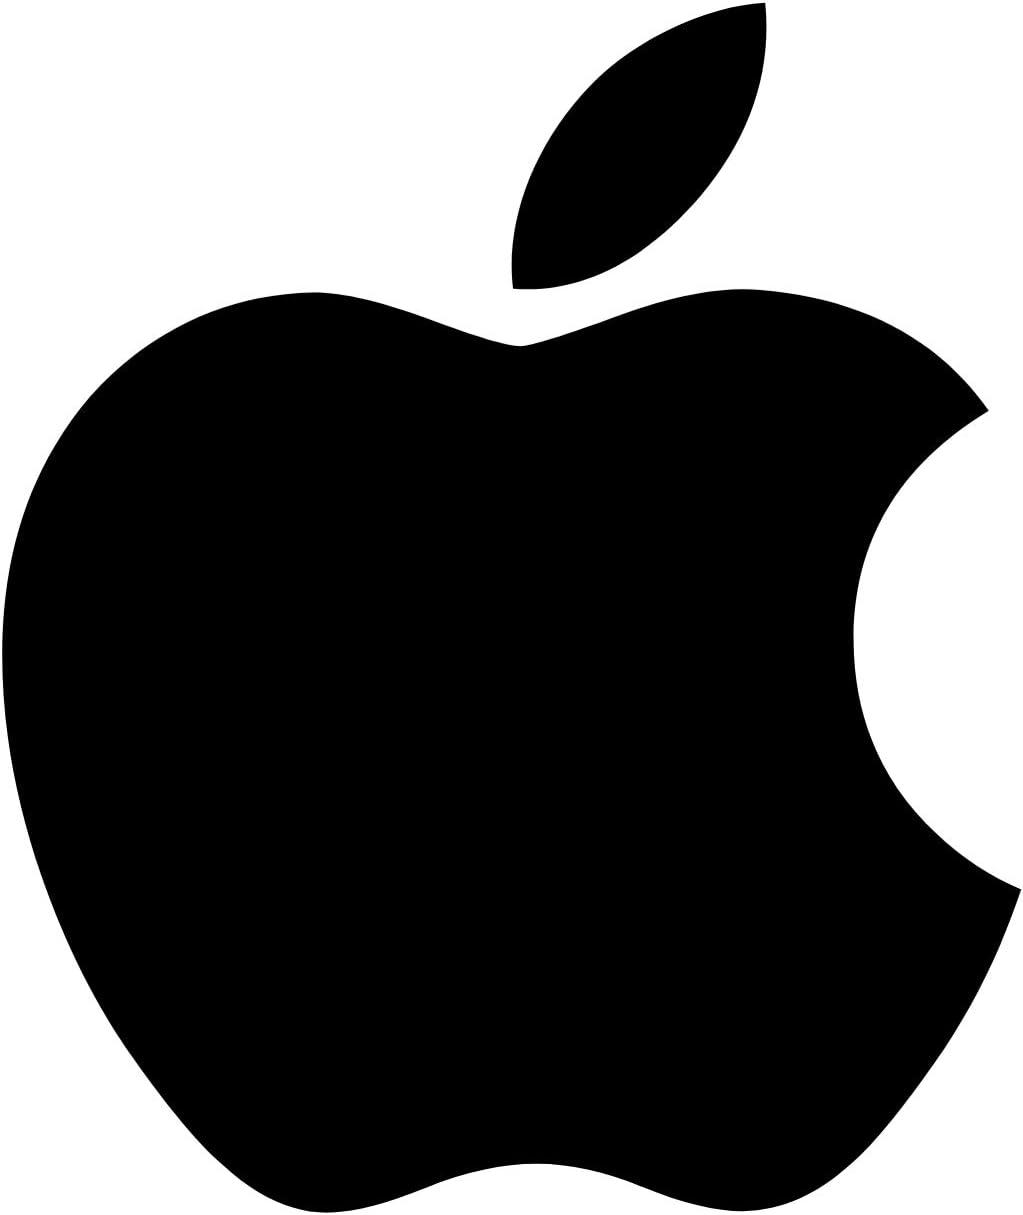 Bianco, XL 10 * 12 cm Galuisi Adesivo Sticker Apple Mela Logo iPhone iOS per Auto Moto Casco.